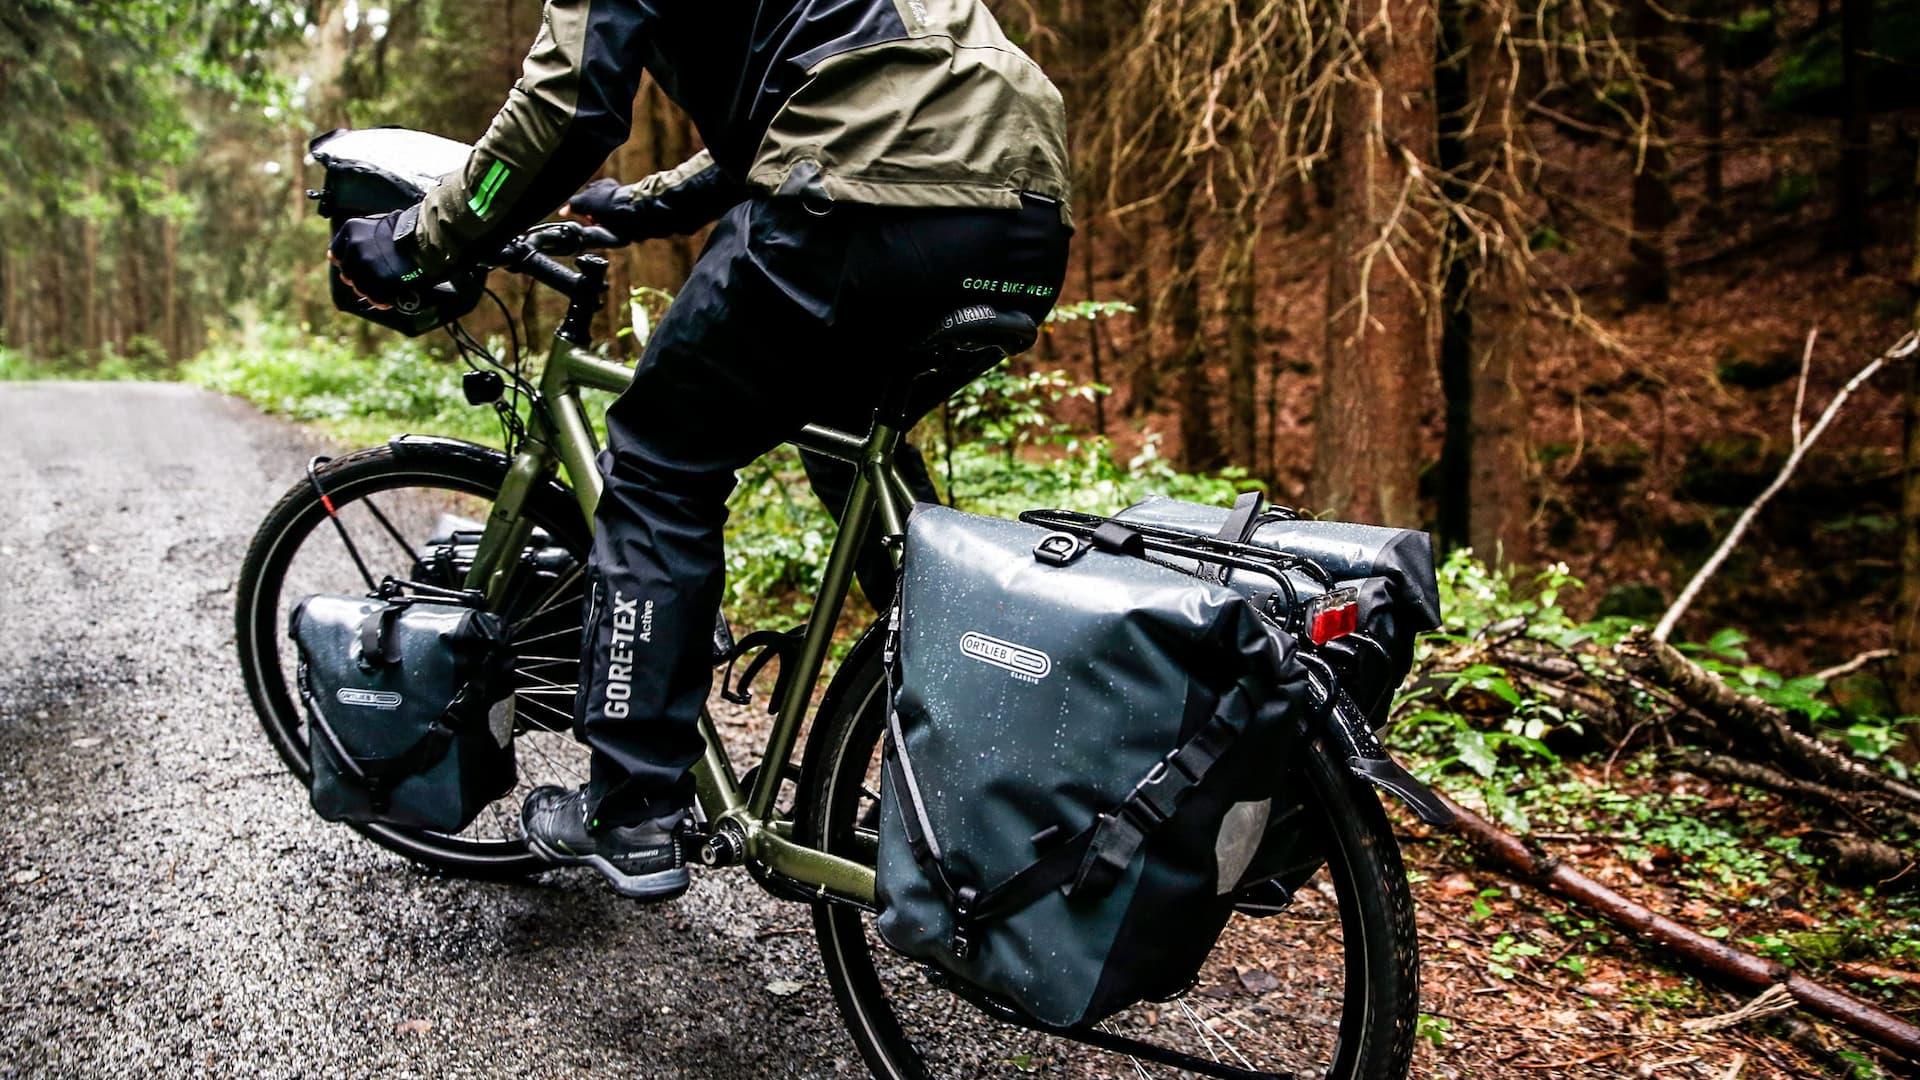 Ortlieb sakwy wodoodporne na rower